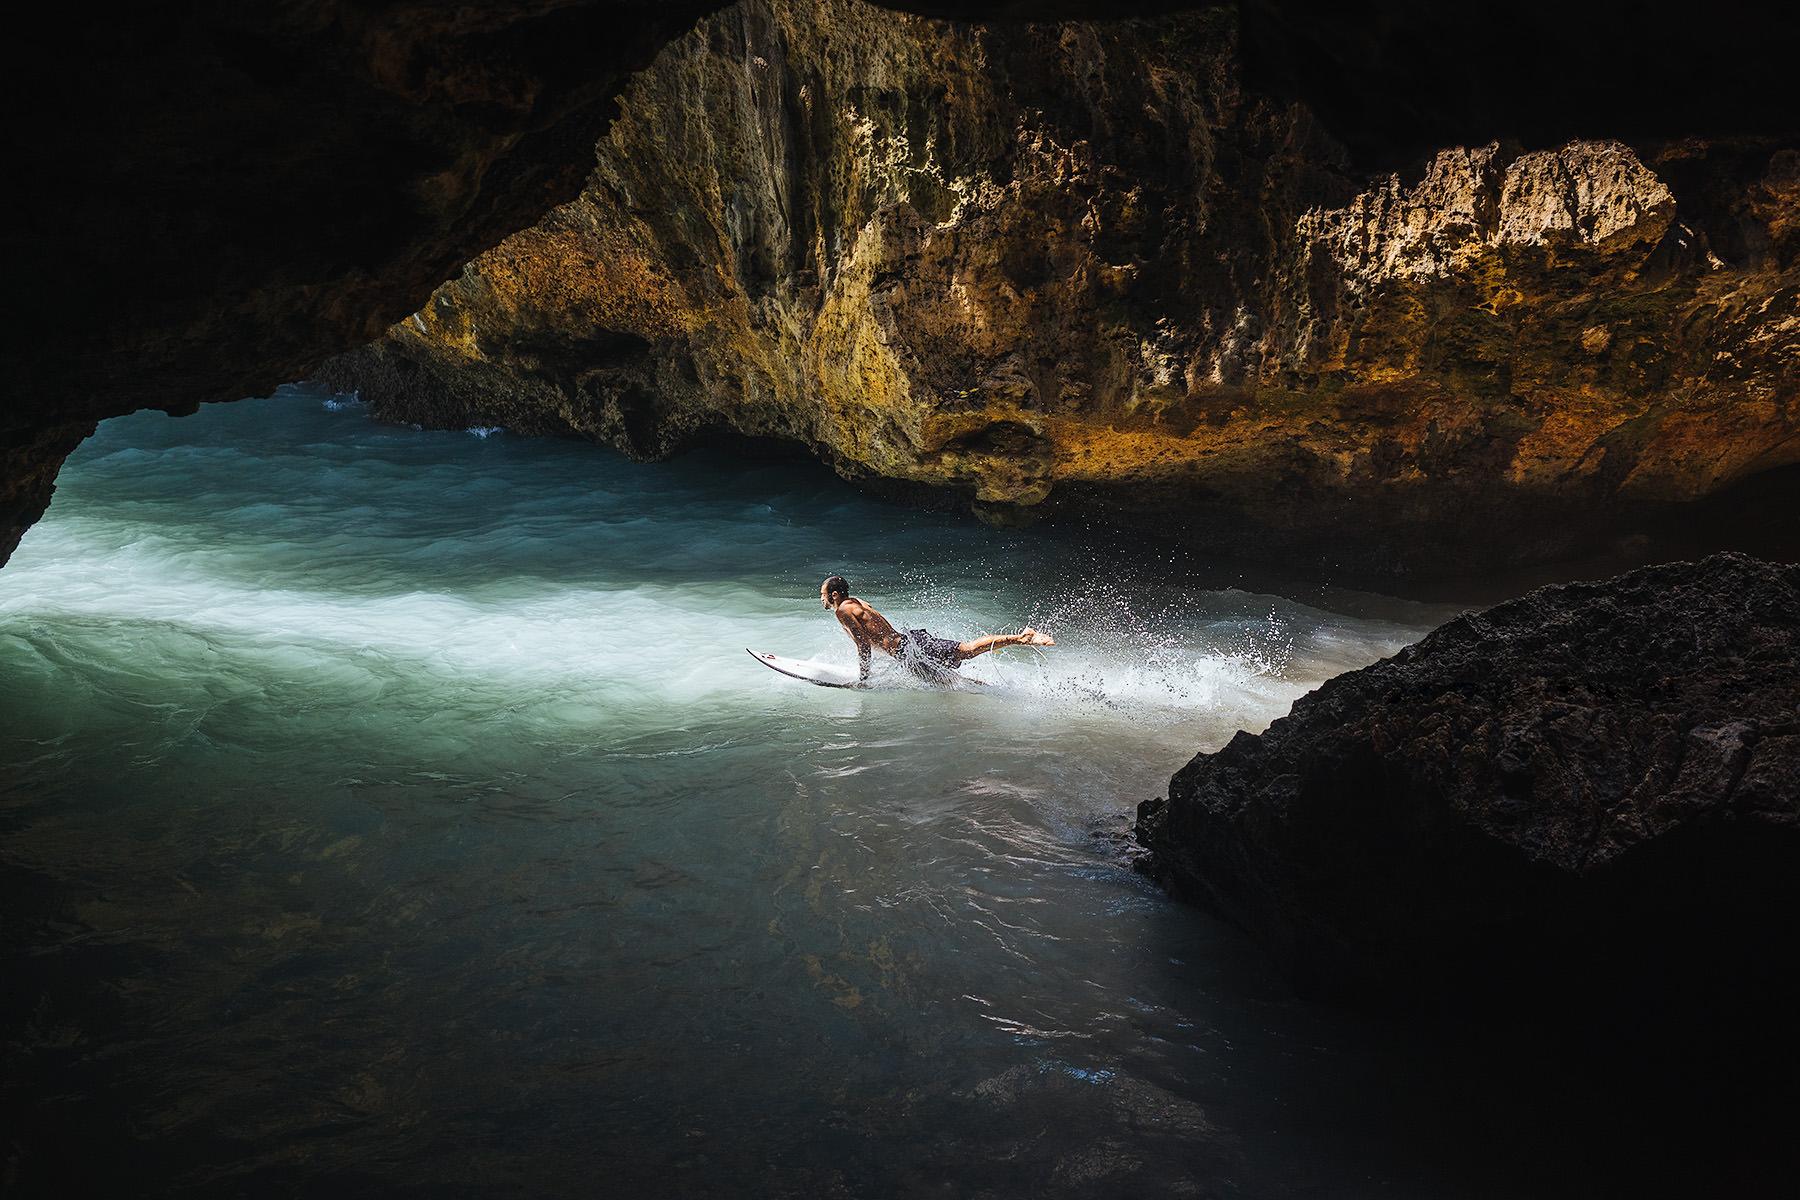 bali-surfing-uluwatu-cave-travel-01.jpg